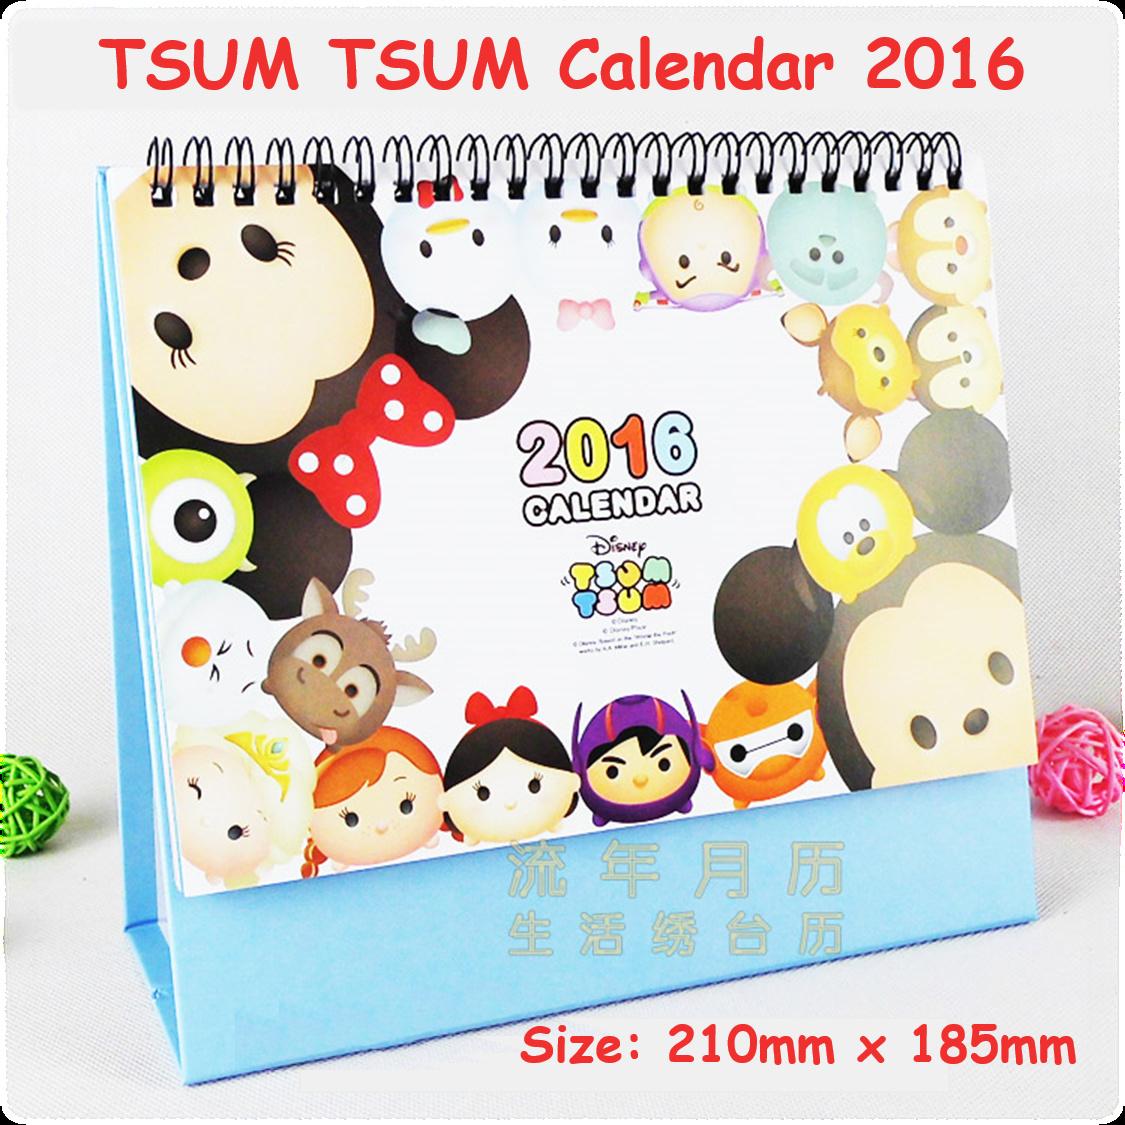 Qoo10 - TSUM TSUM/Disney/Desktop/Calendar 2016/New Year/Gift : Toys